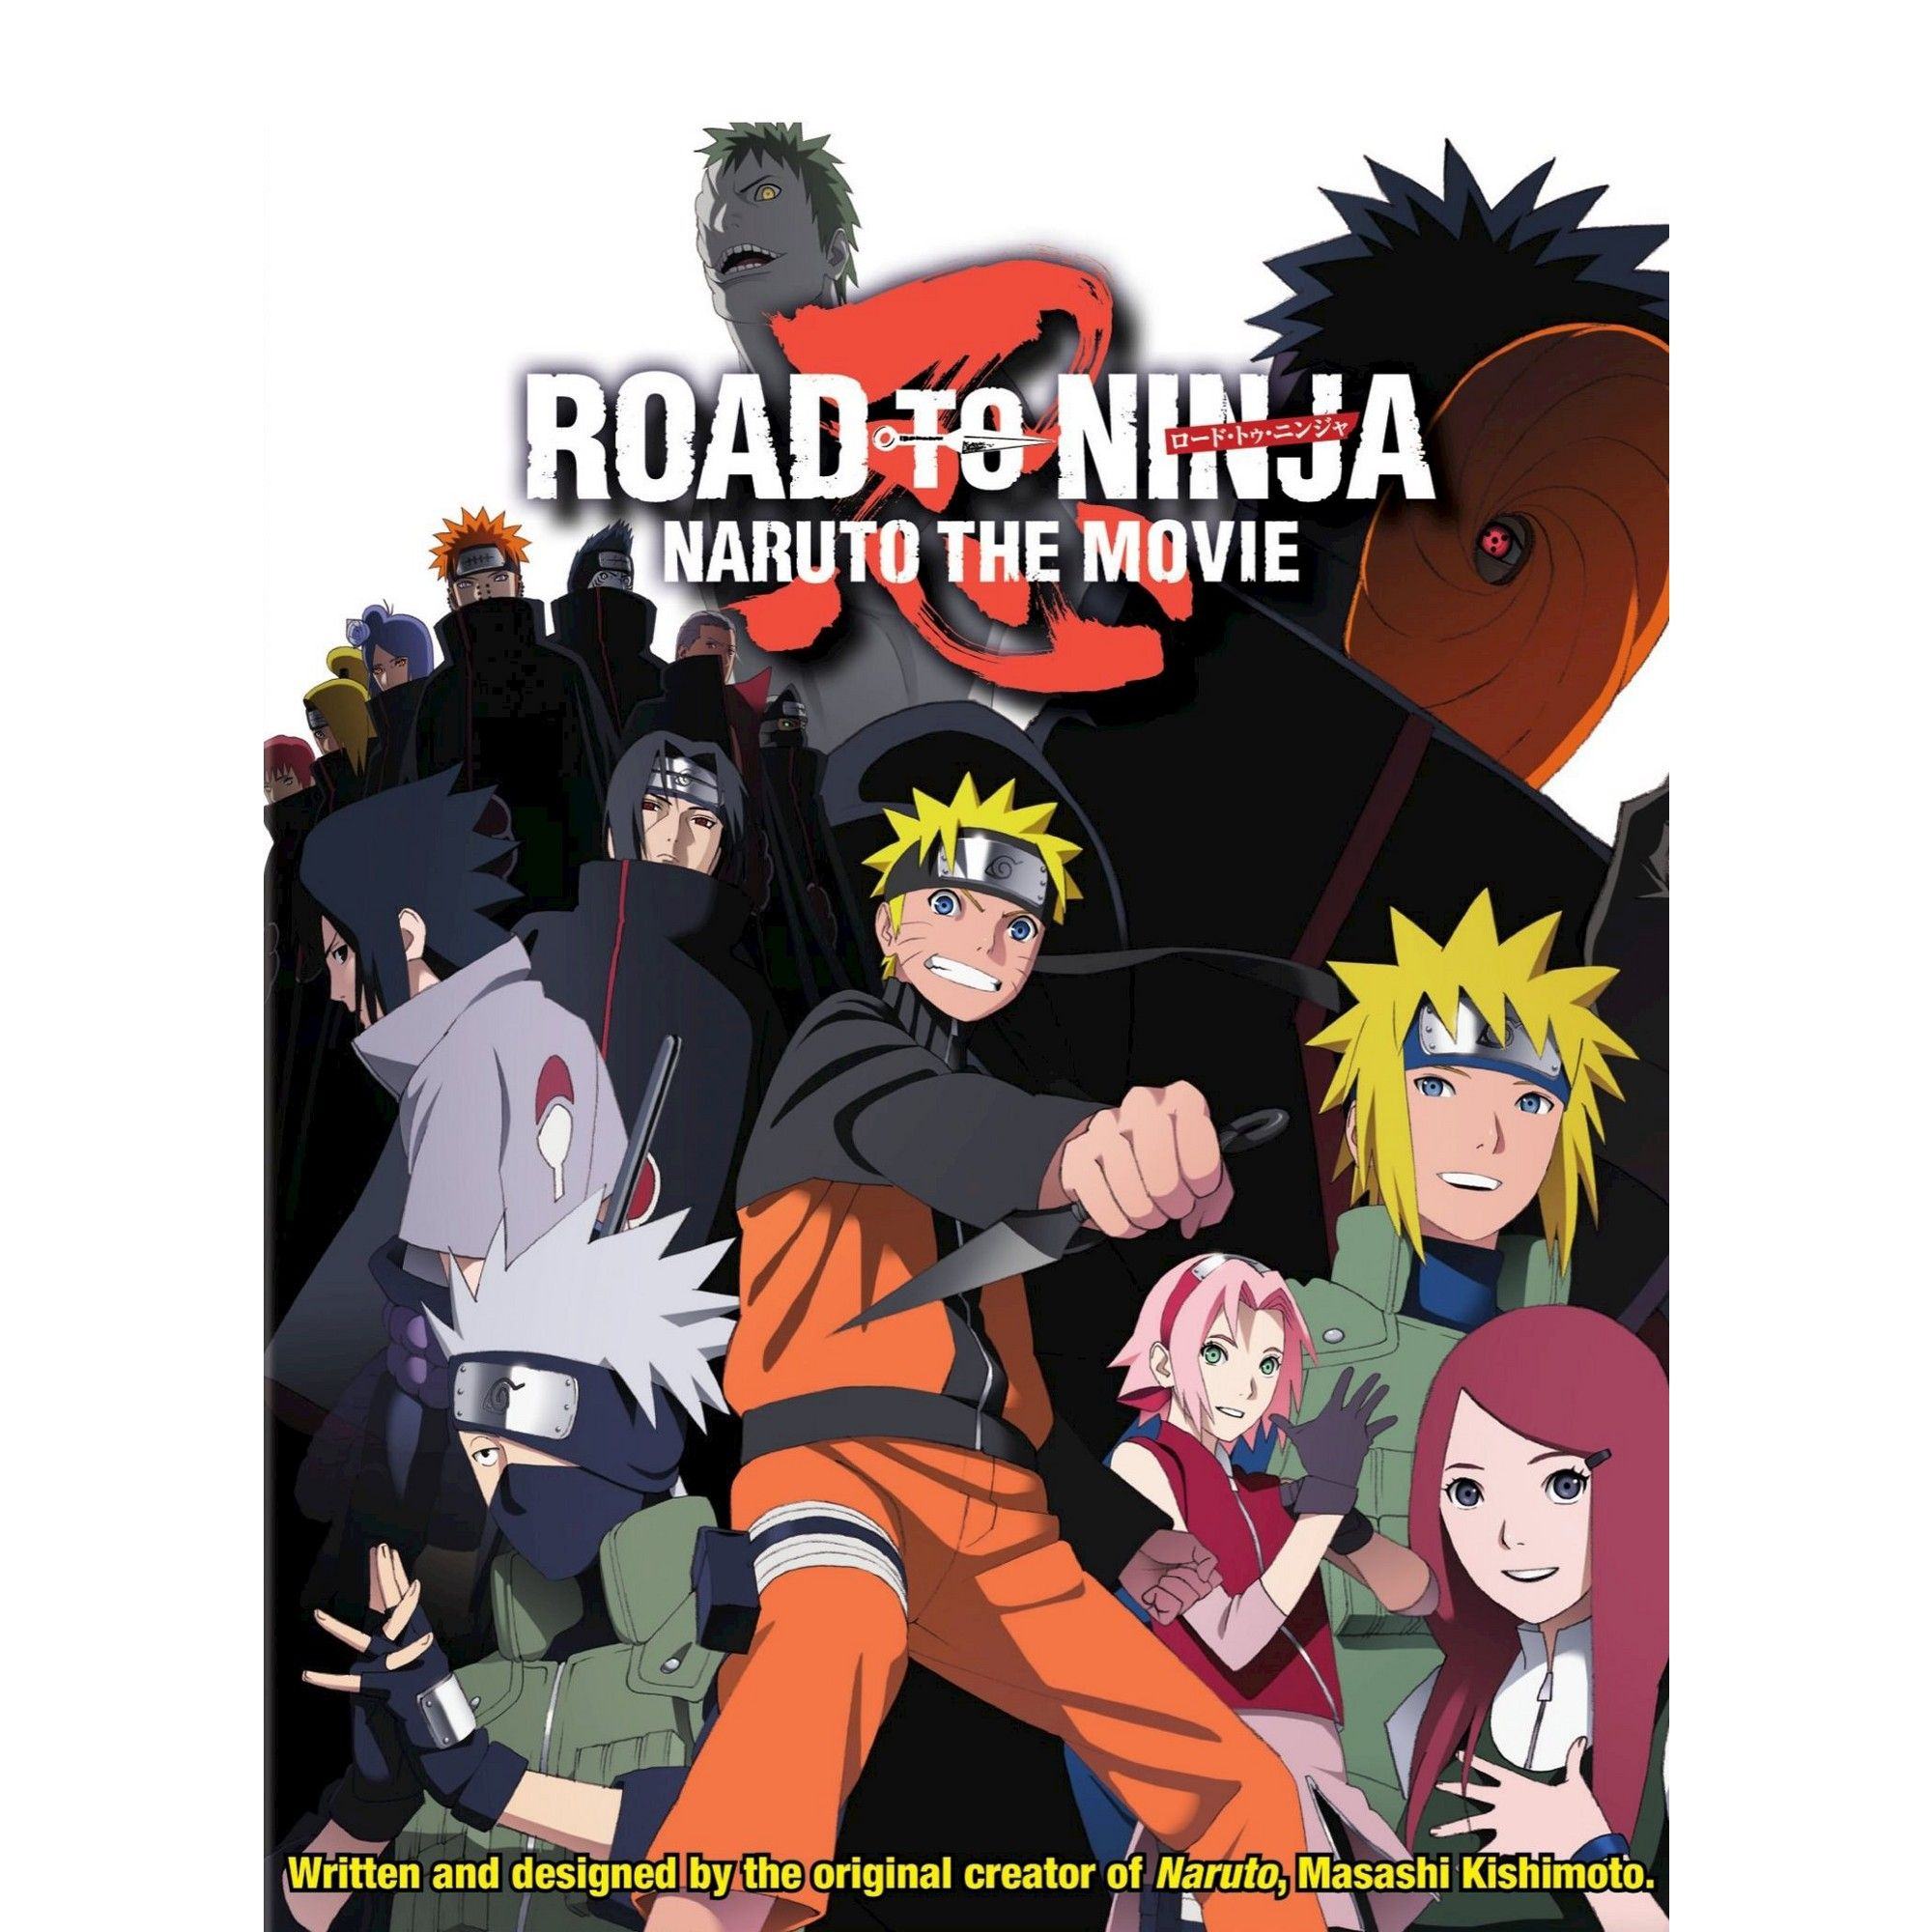 Naruto Shippuden The Movie Road To Ninja Blu Ray 2014 In 2021 Ninja Movies Naruto Shippuden The Movie Naruto The Movie